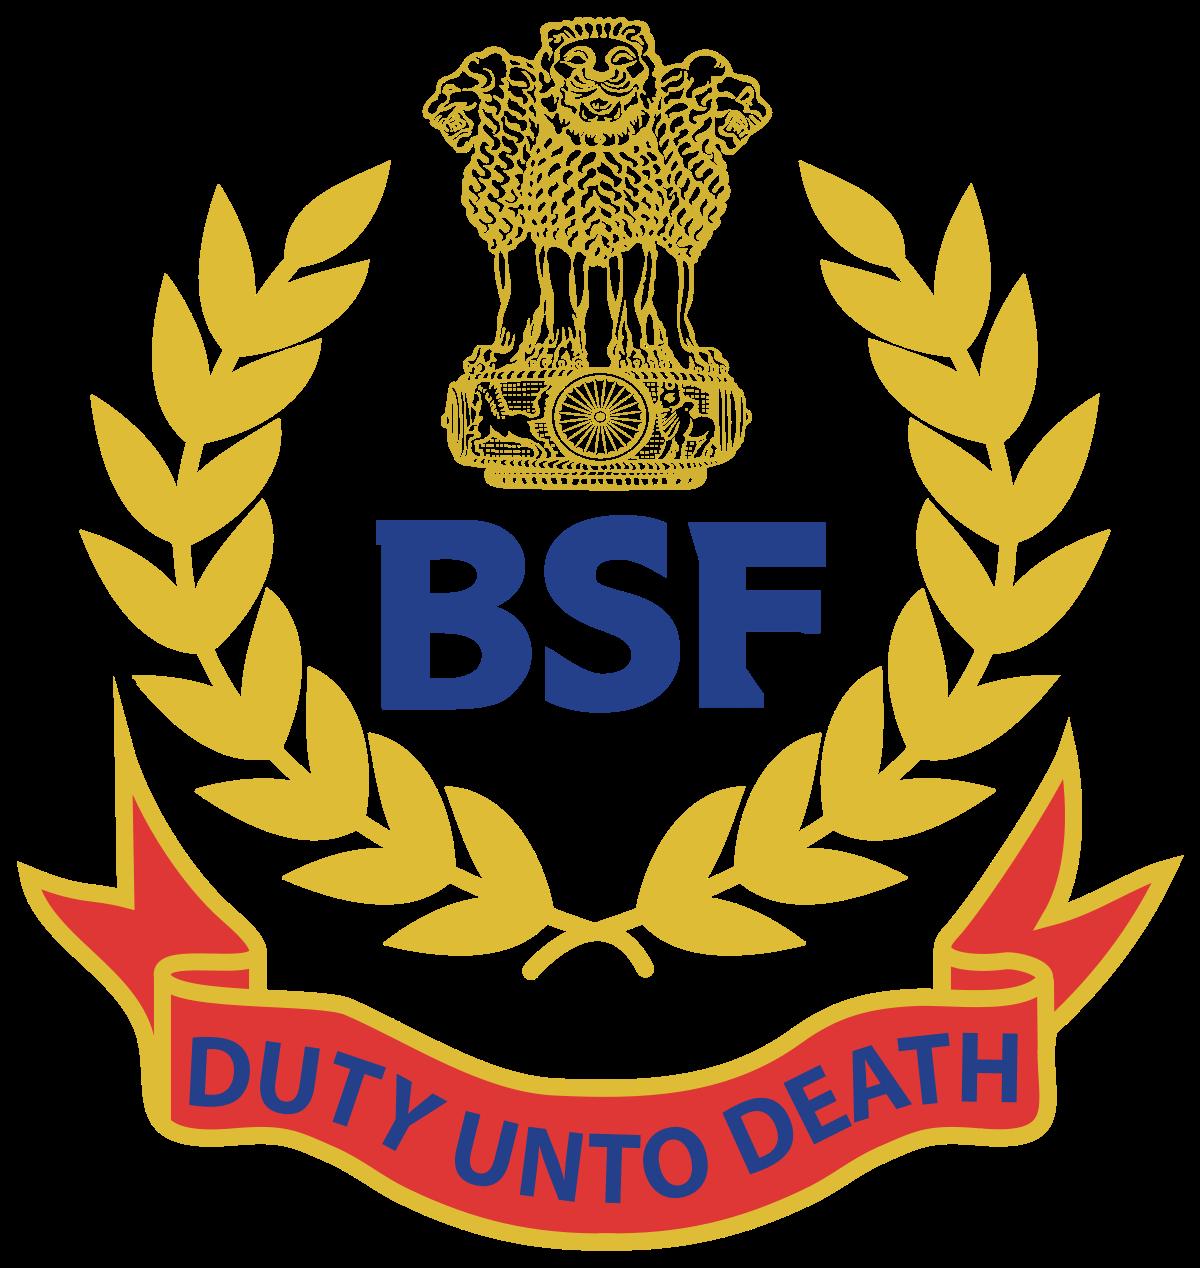 BSF Notification 2020